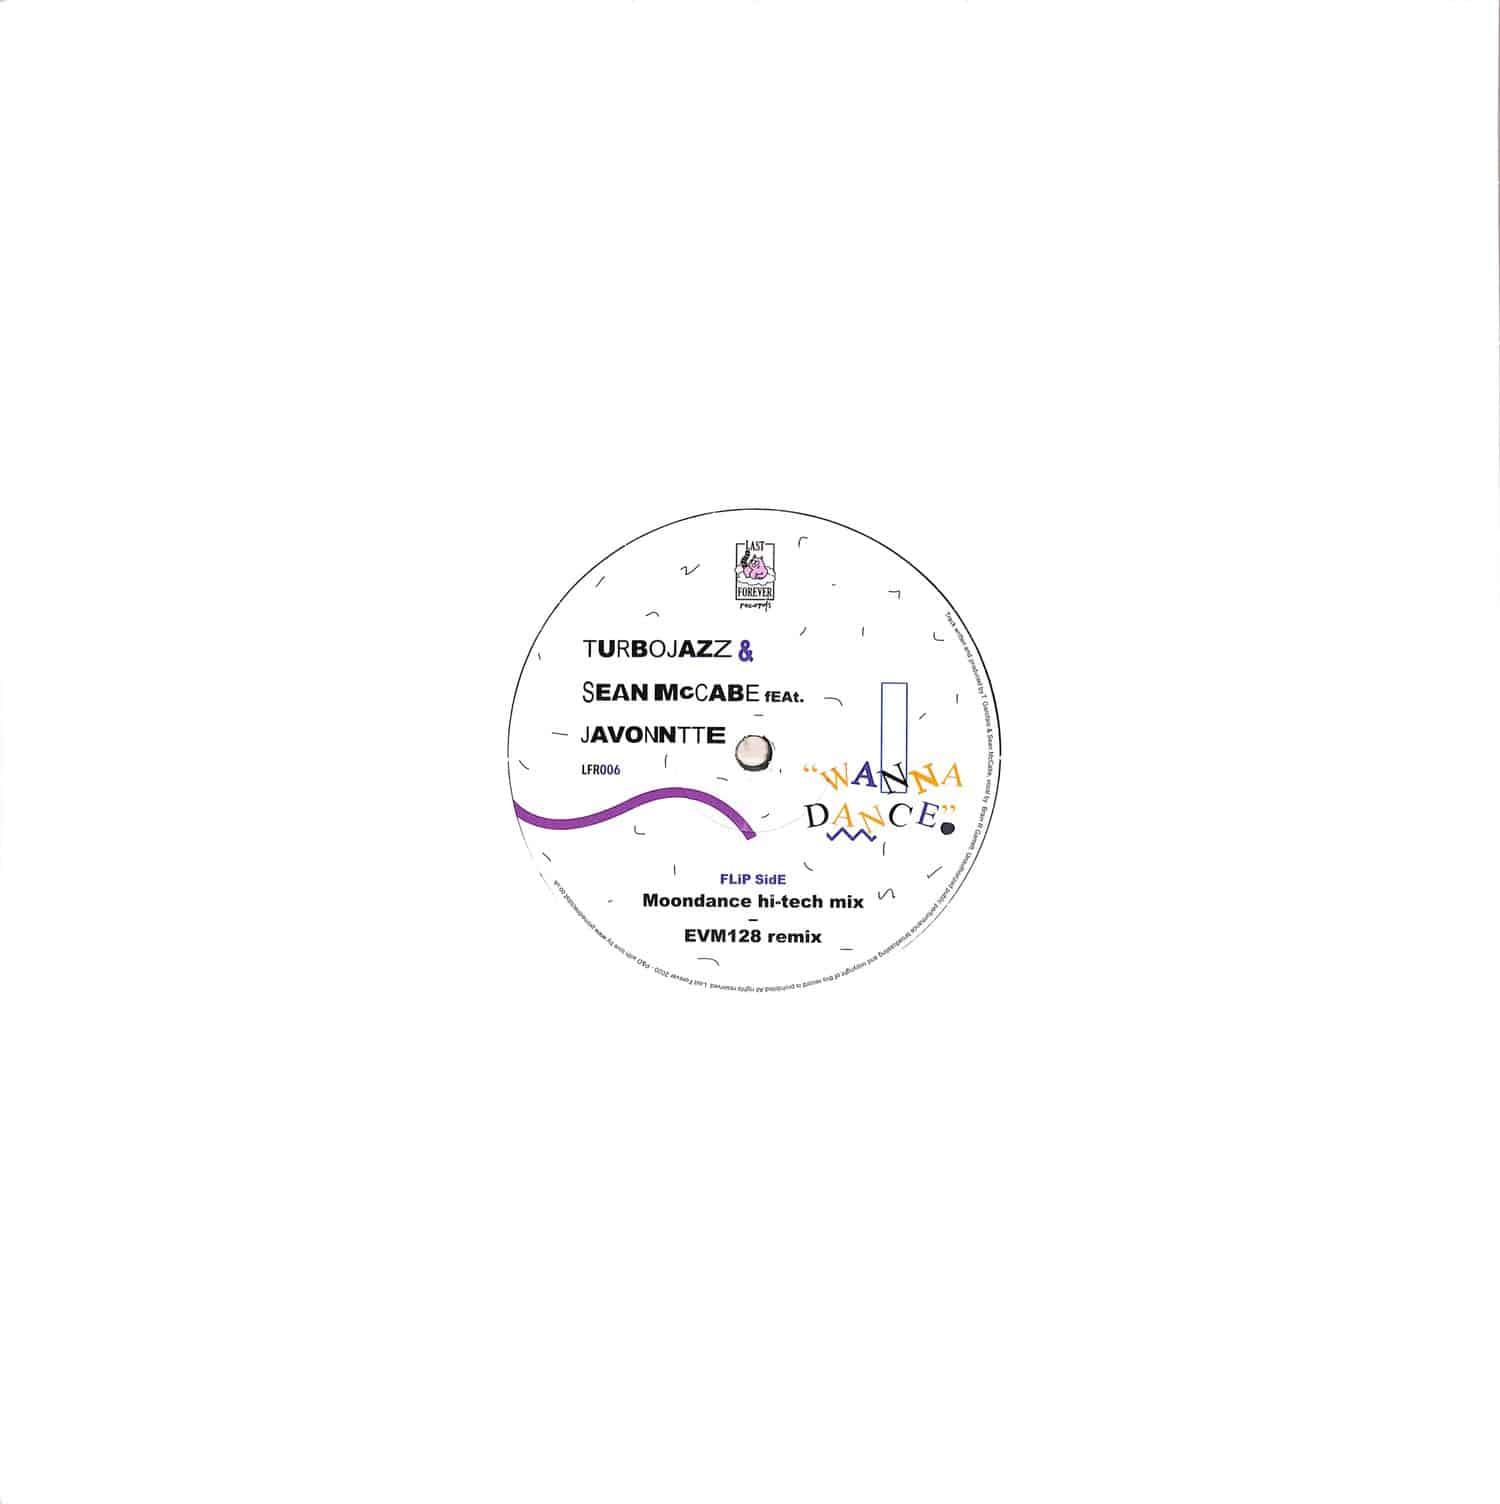 Turbojazz / Sean Mccabe Featuring Javonntte - WANNA DANCE